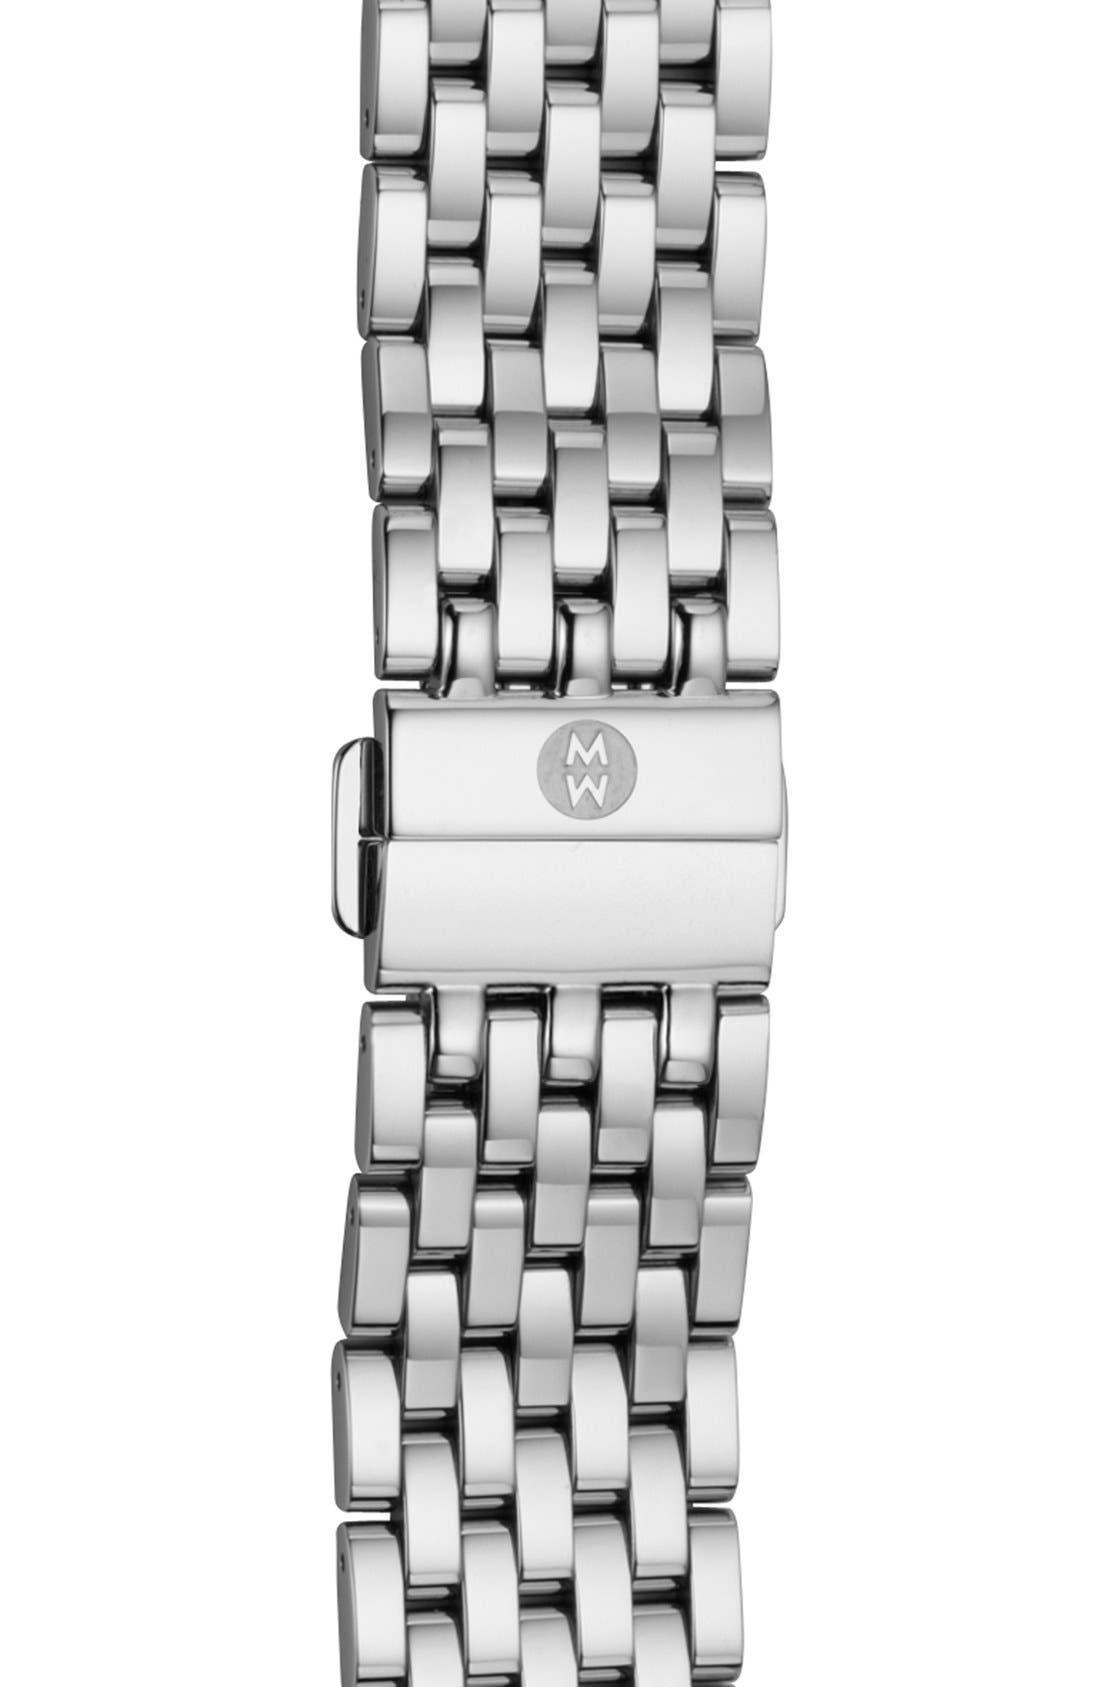 Alternate Image 1 Selected - MICHELE 'Fluette' 18mm Two Tone Bracelet Watch Band